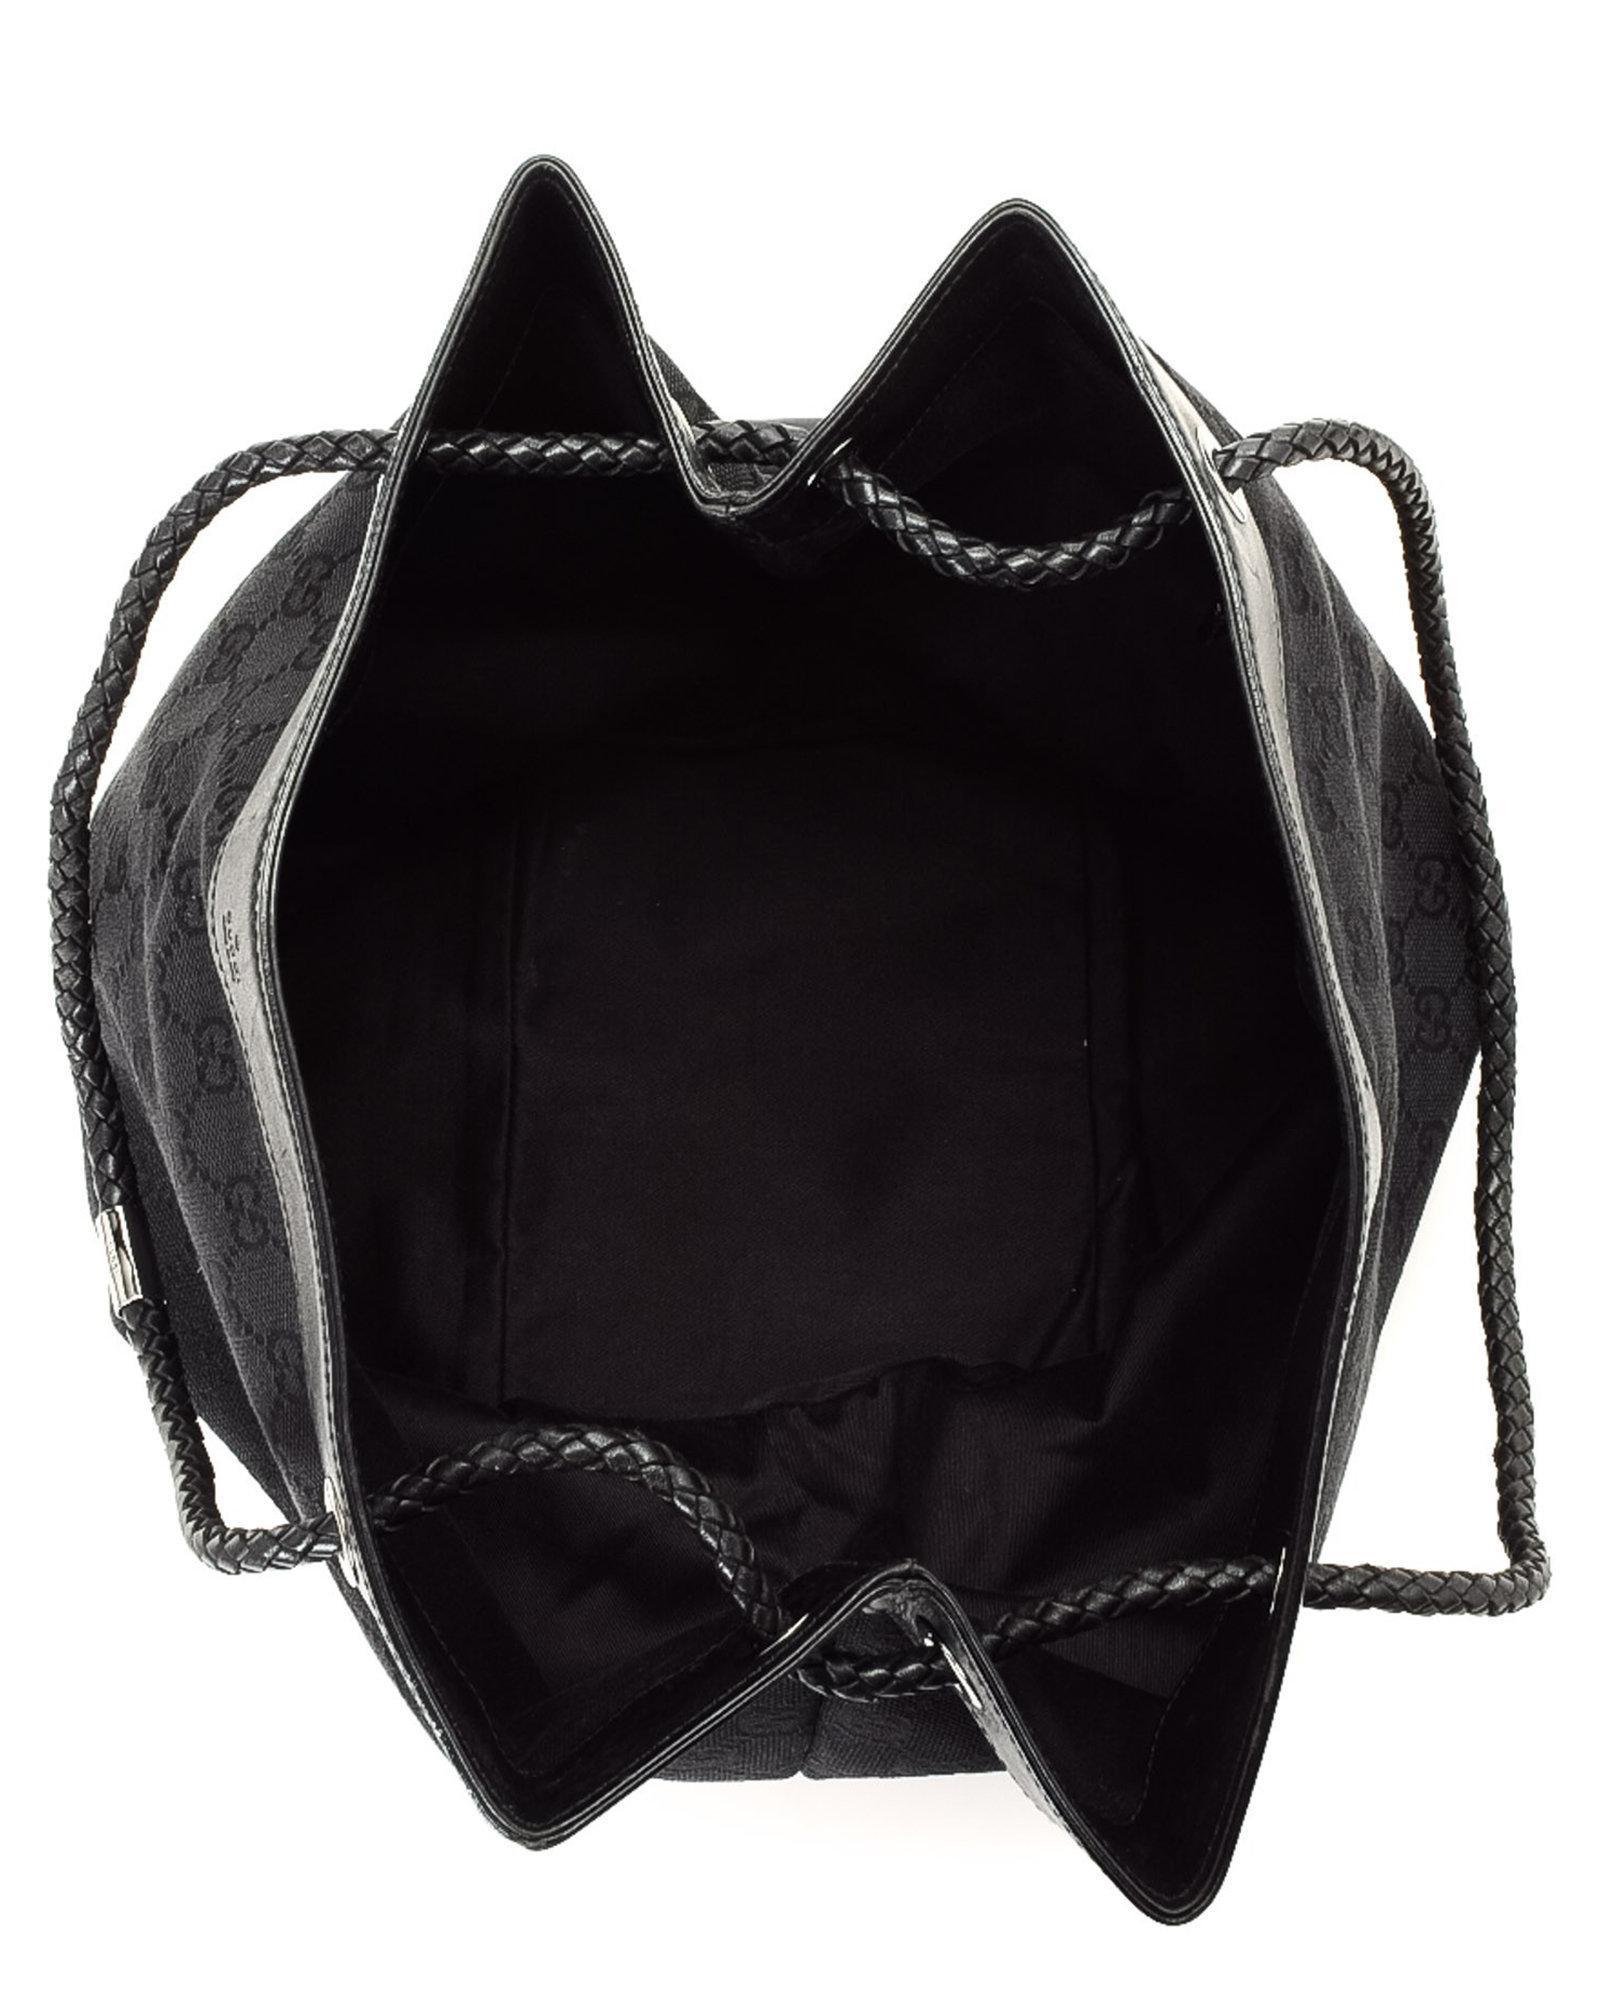 9f8484627f4 Lyst - Gucci Gg Canvas Tote Bag - Vintage in Black